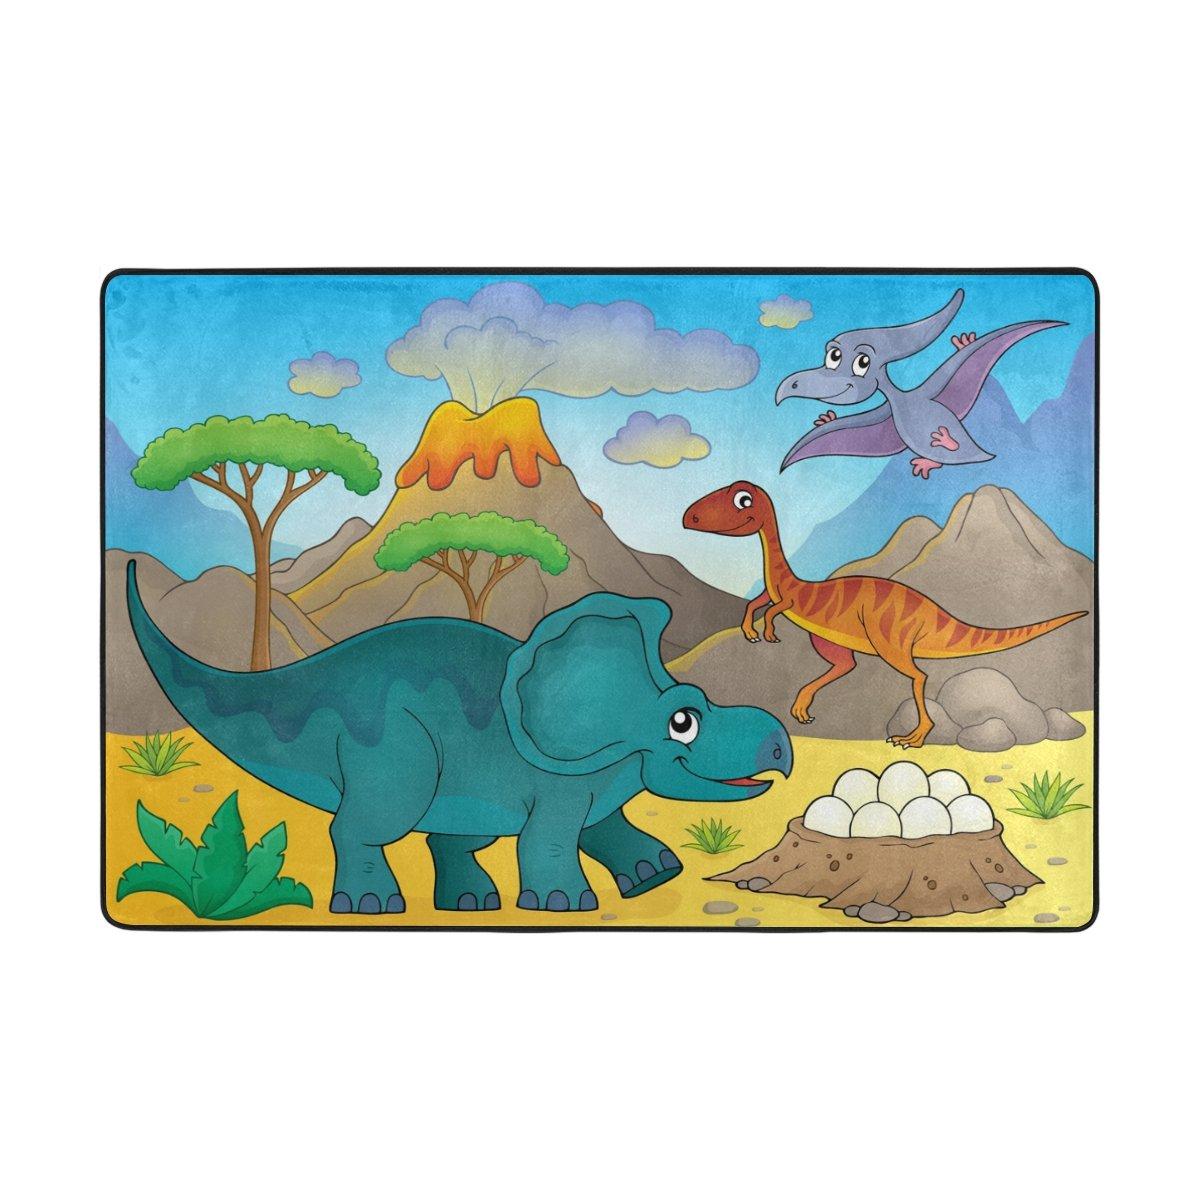 My Little Nest Animal Theme Cartoon Dinosaur Kids Playroom Floor Mat Non Slip Soft Bedroom Door Mat Classroom Rug Carpet 2' x 3'